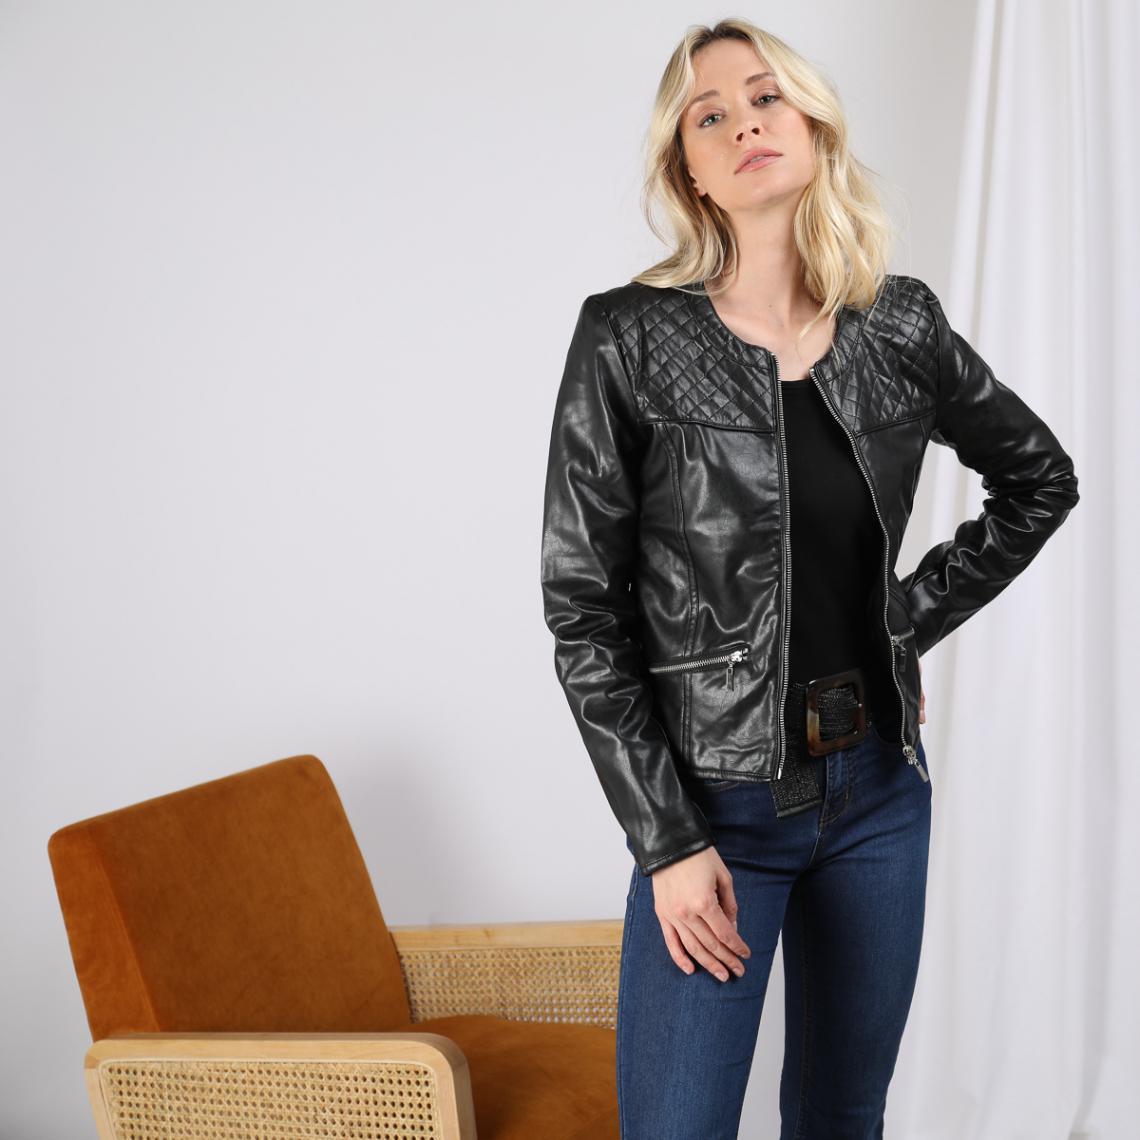 Vestes en cuir simili cuir Femme | 3 SUISSES